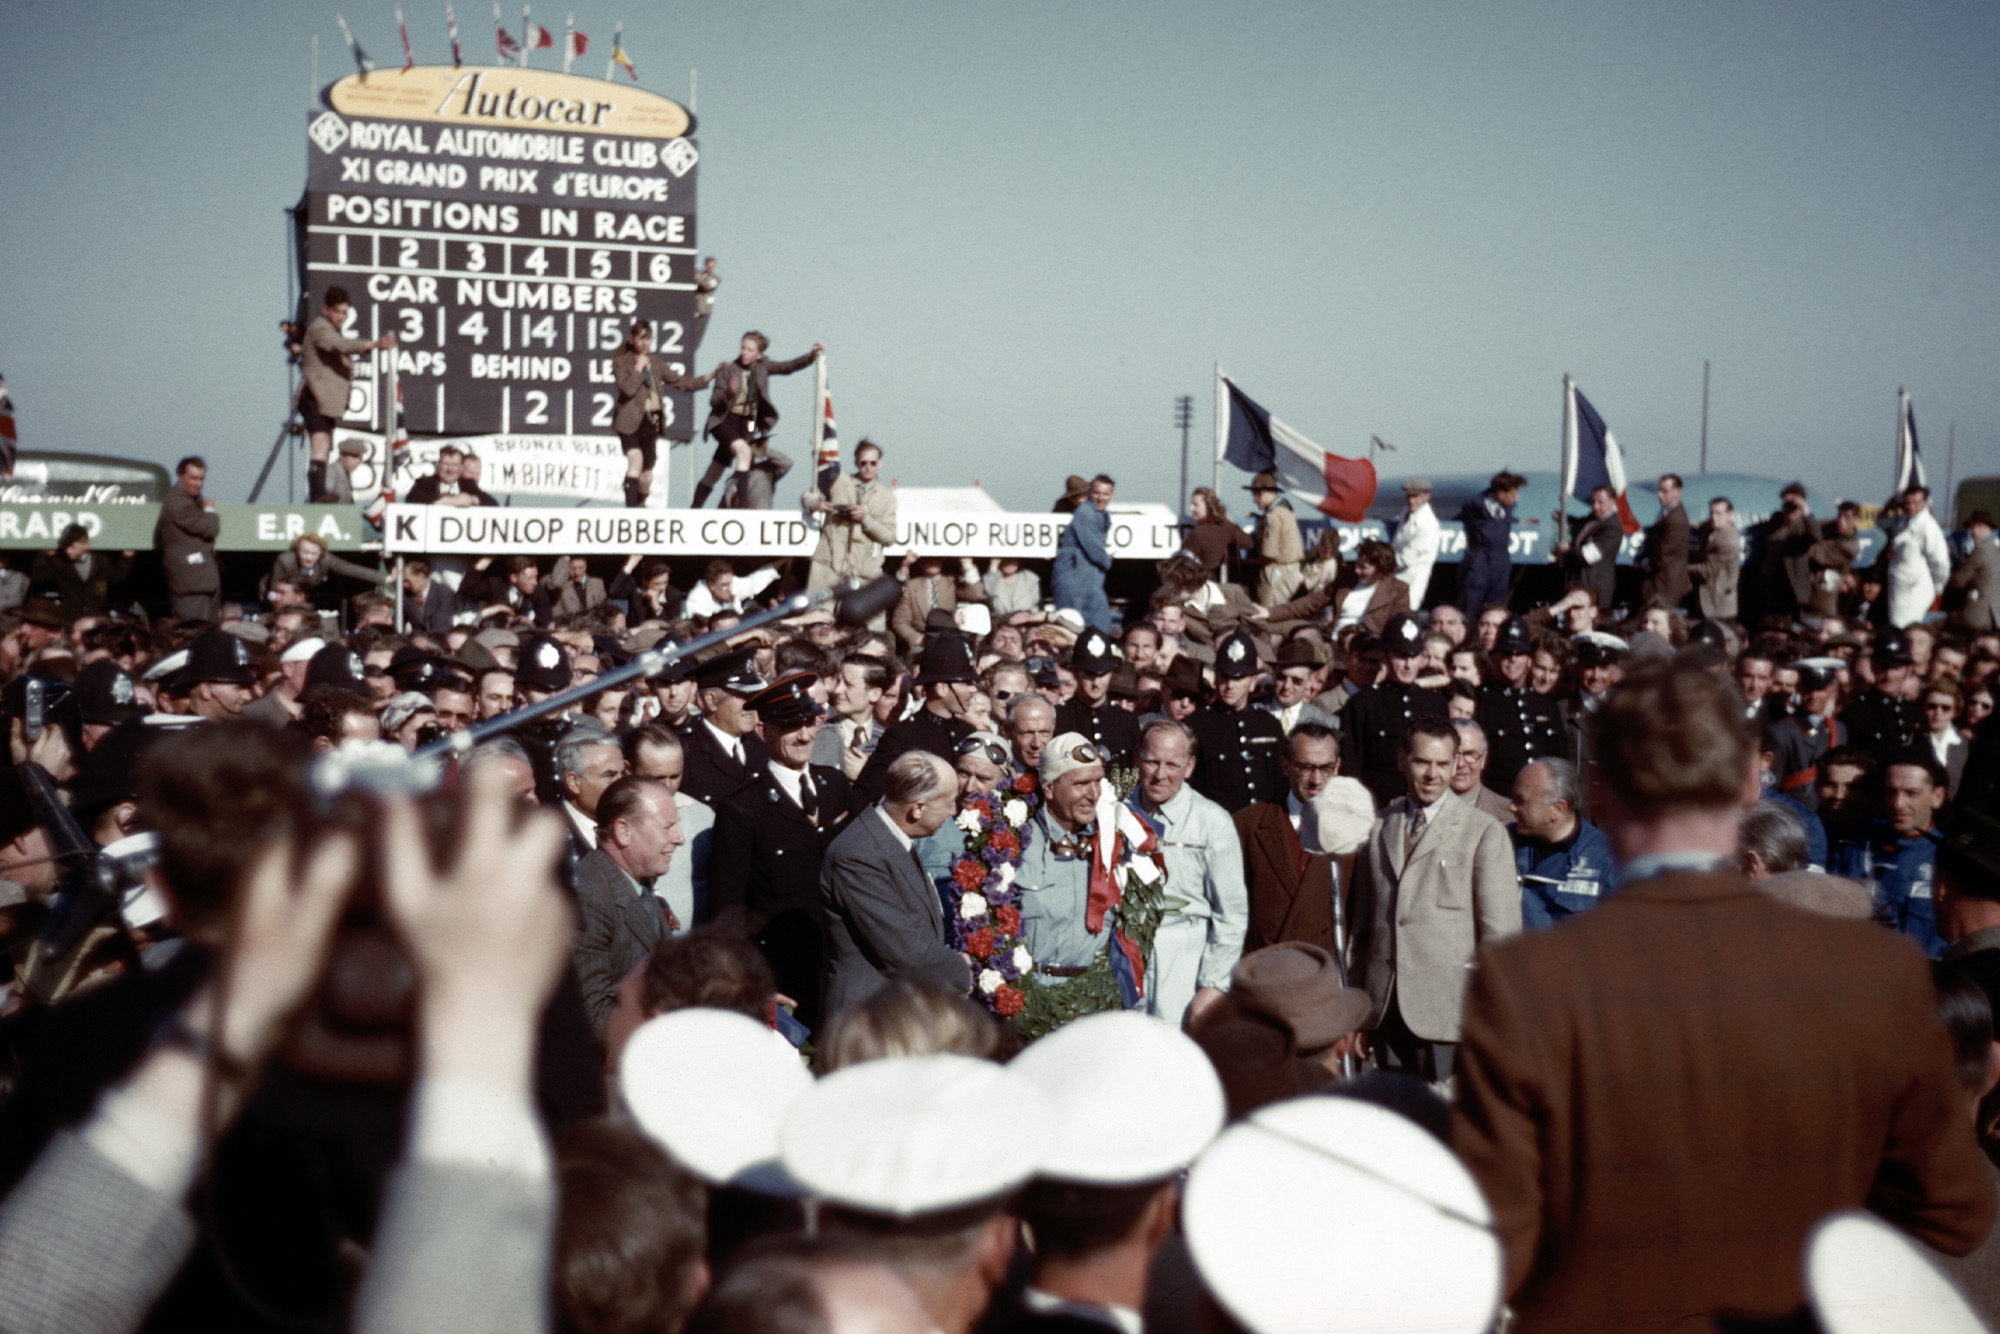 Crowds gather around Giuseppe Farina after he wins the 1950 British Grand Prix